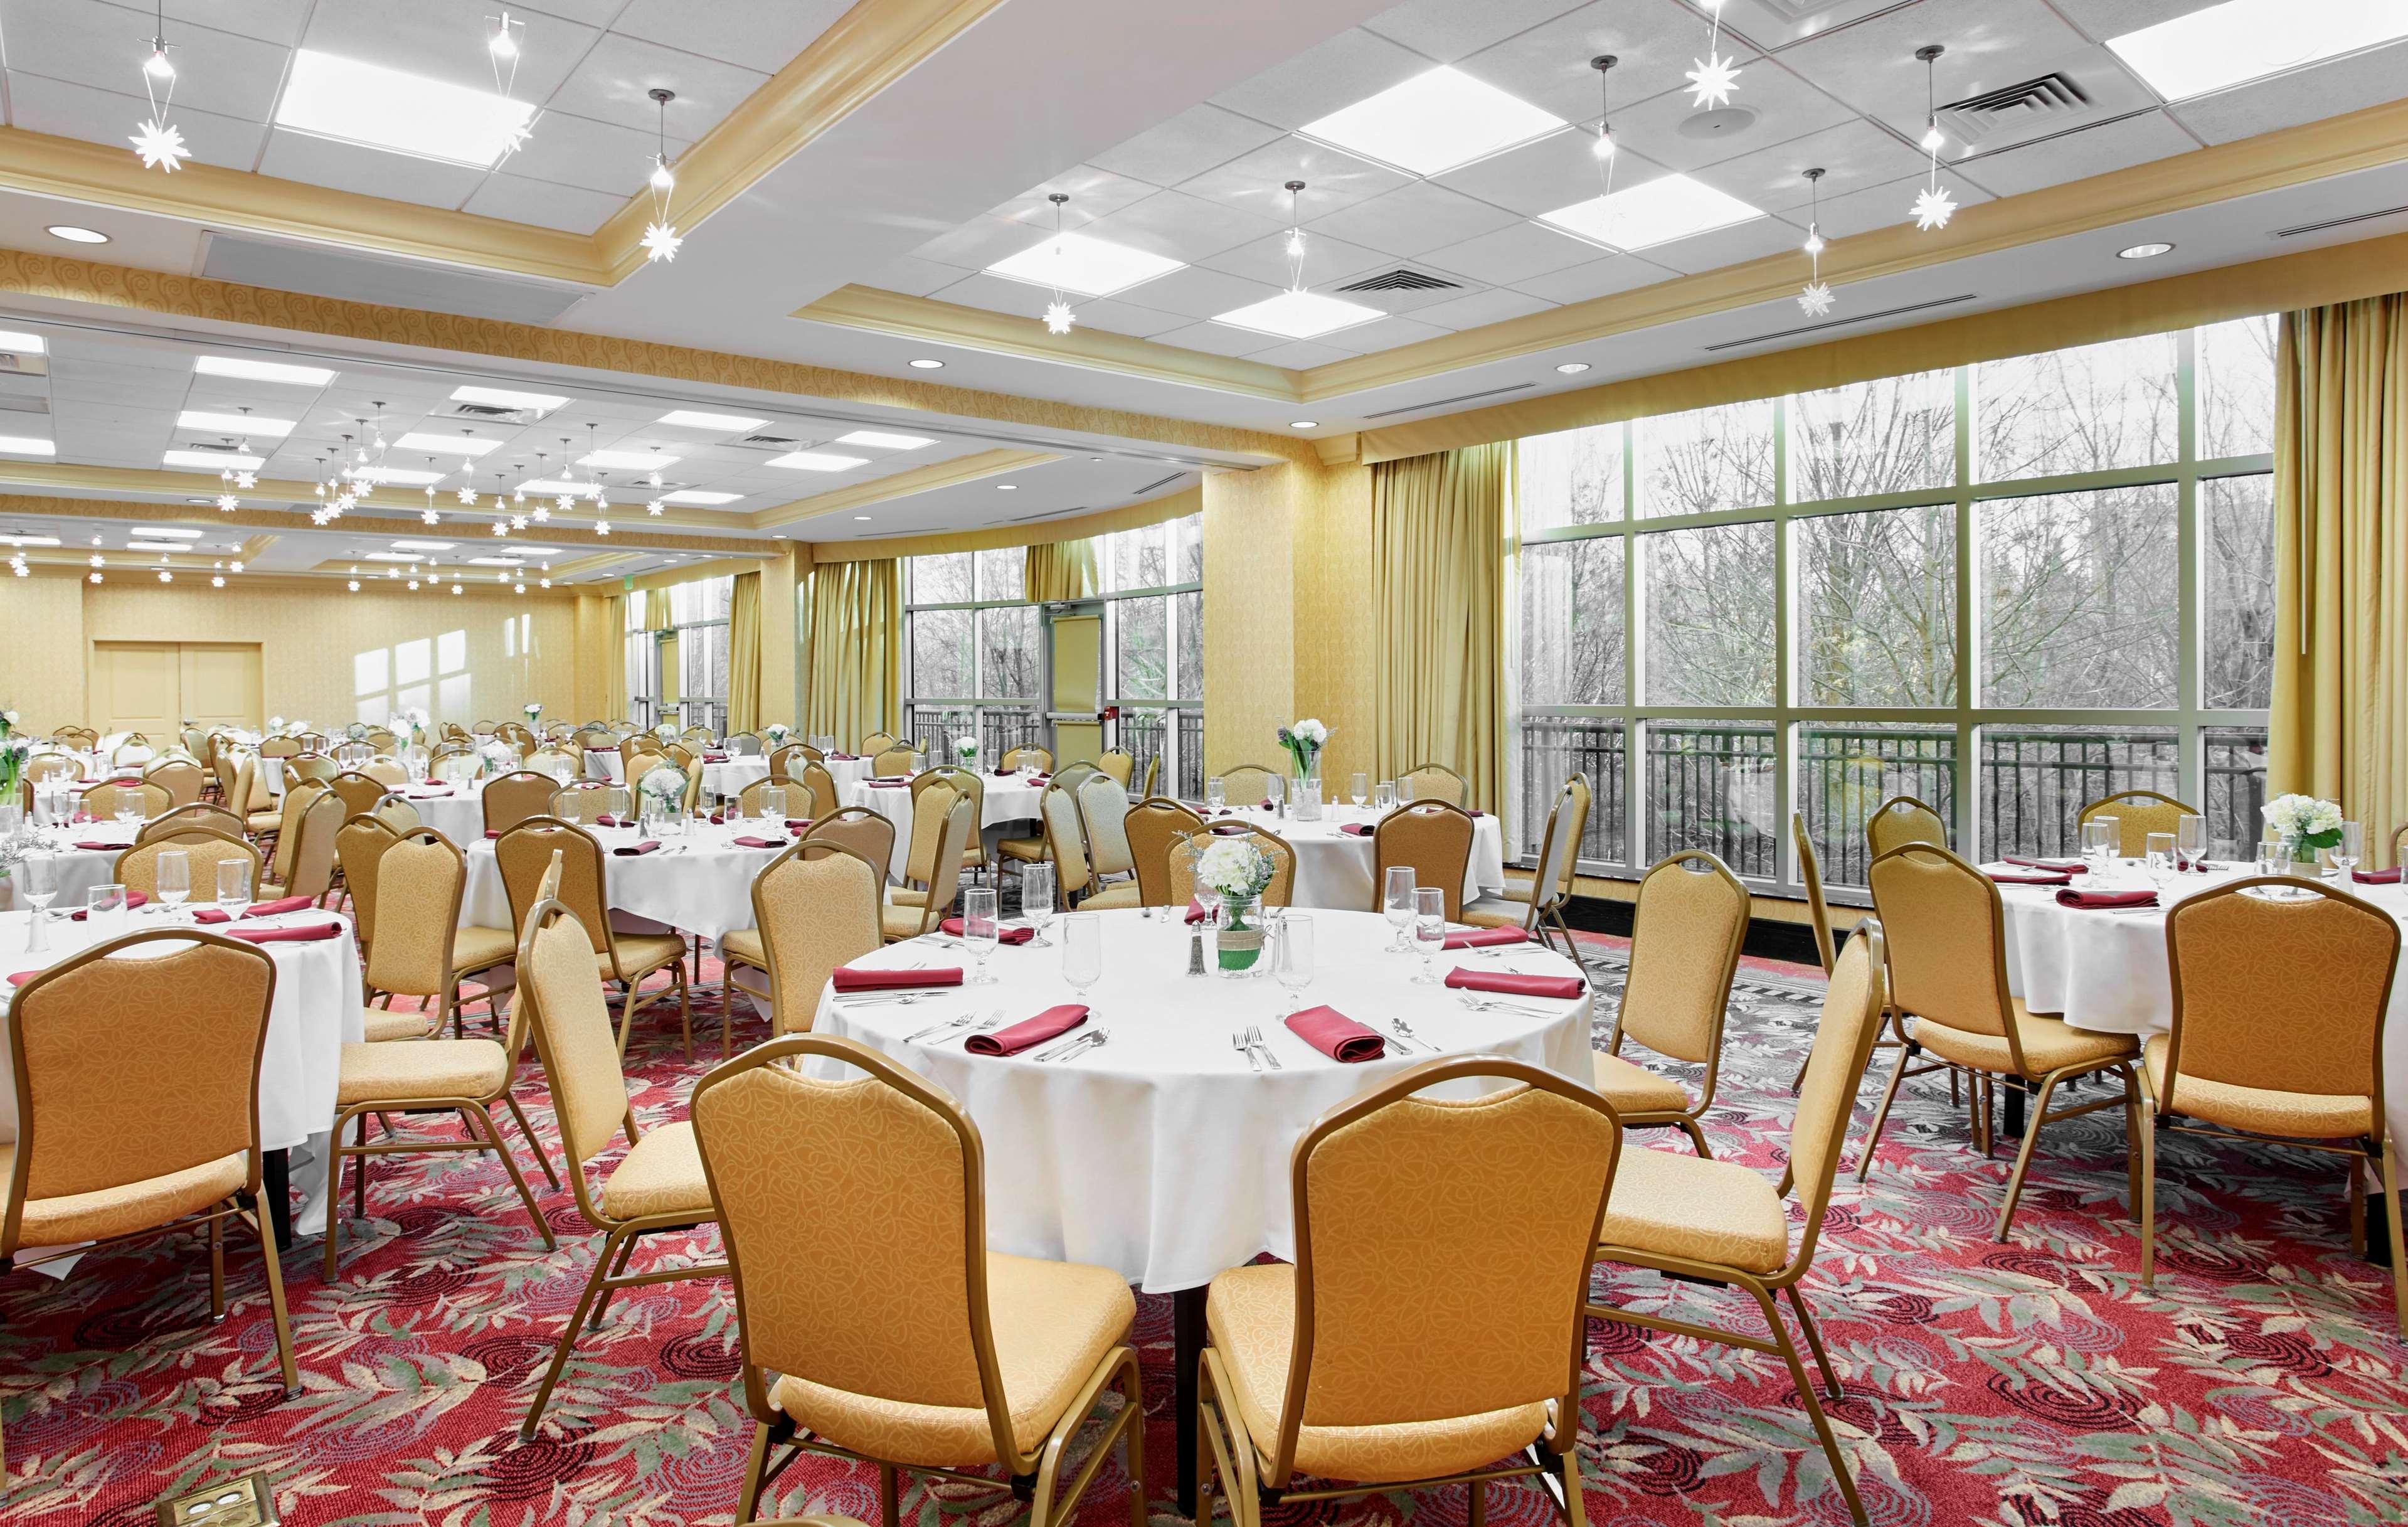 Hilton Garden Inn Rockville-Gaithersburg image 15